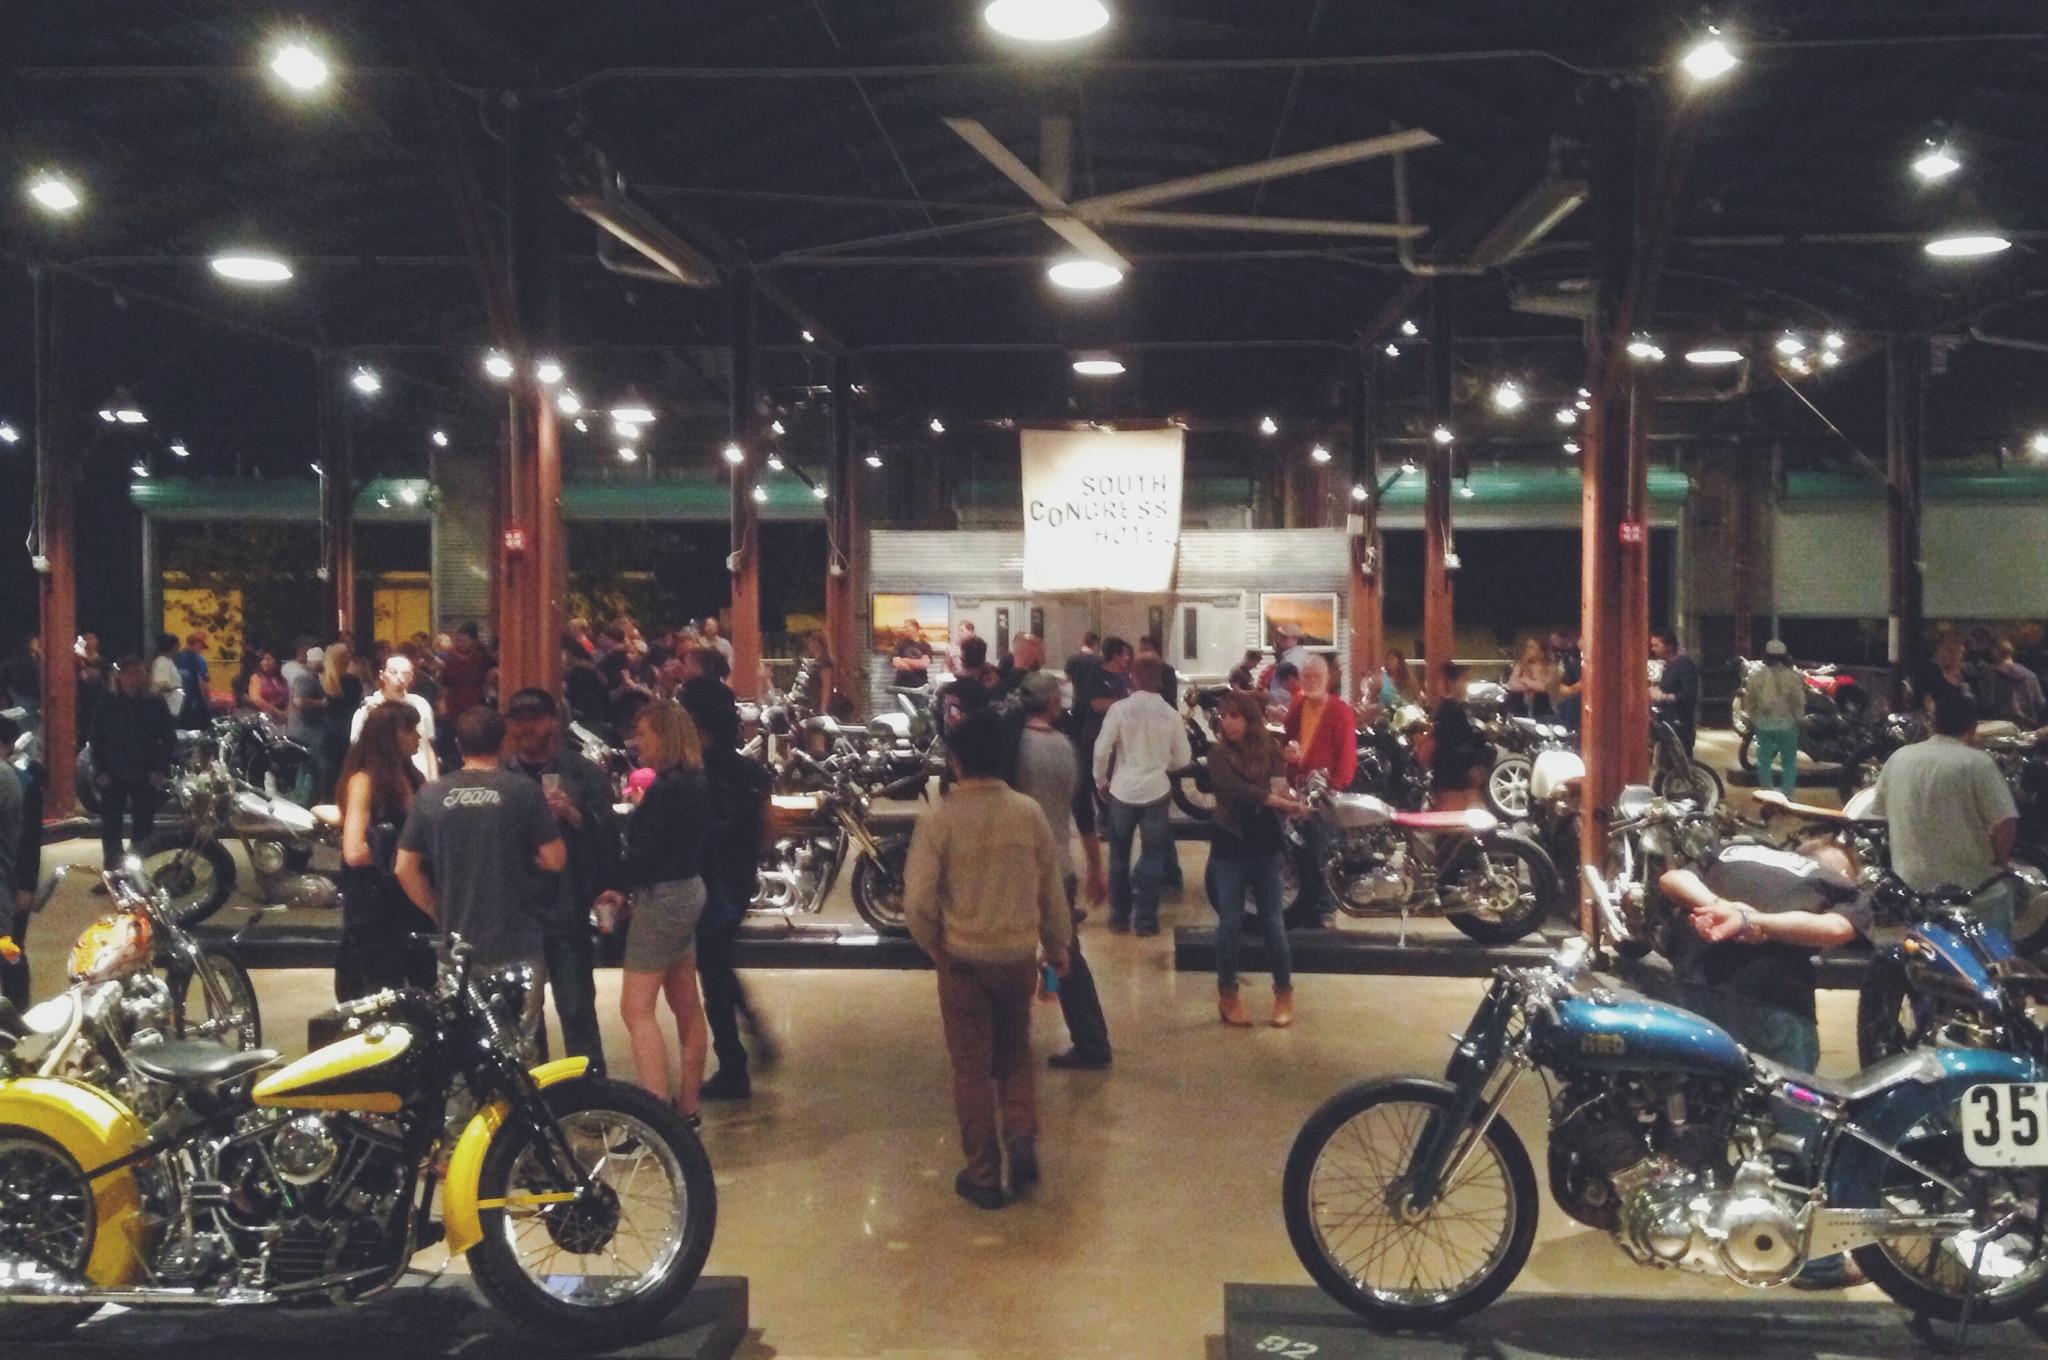 The Handbuilt Motorcycle Show and the COTA MotoGP Race